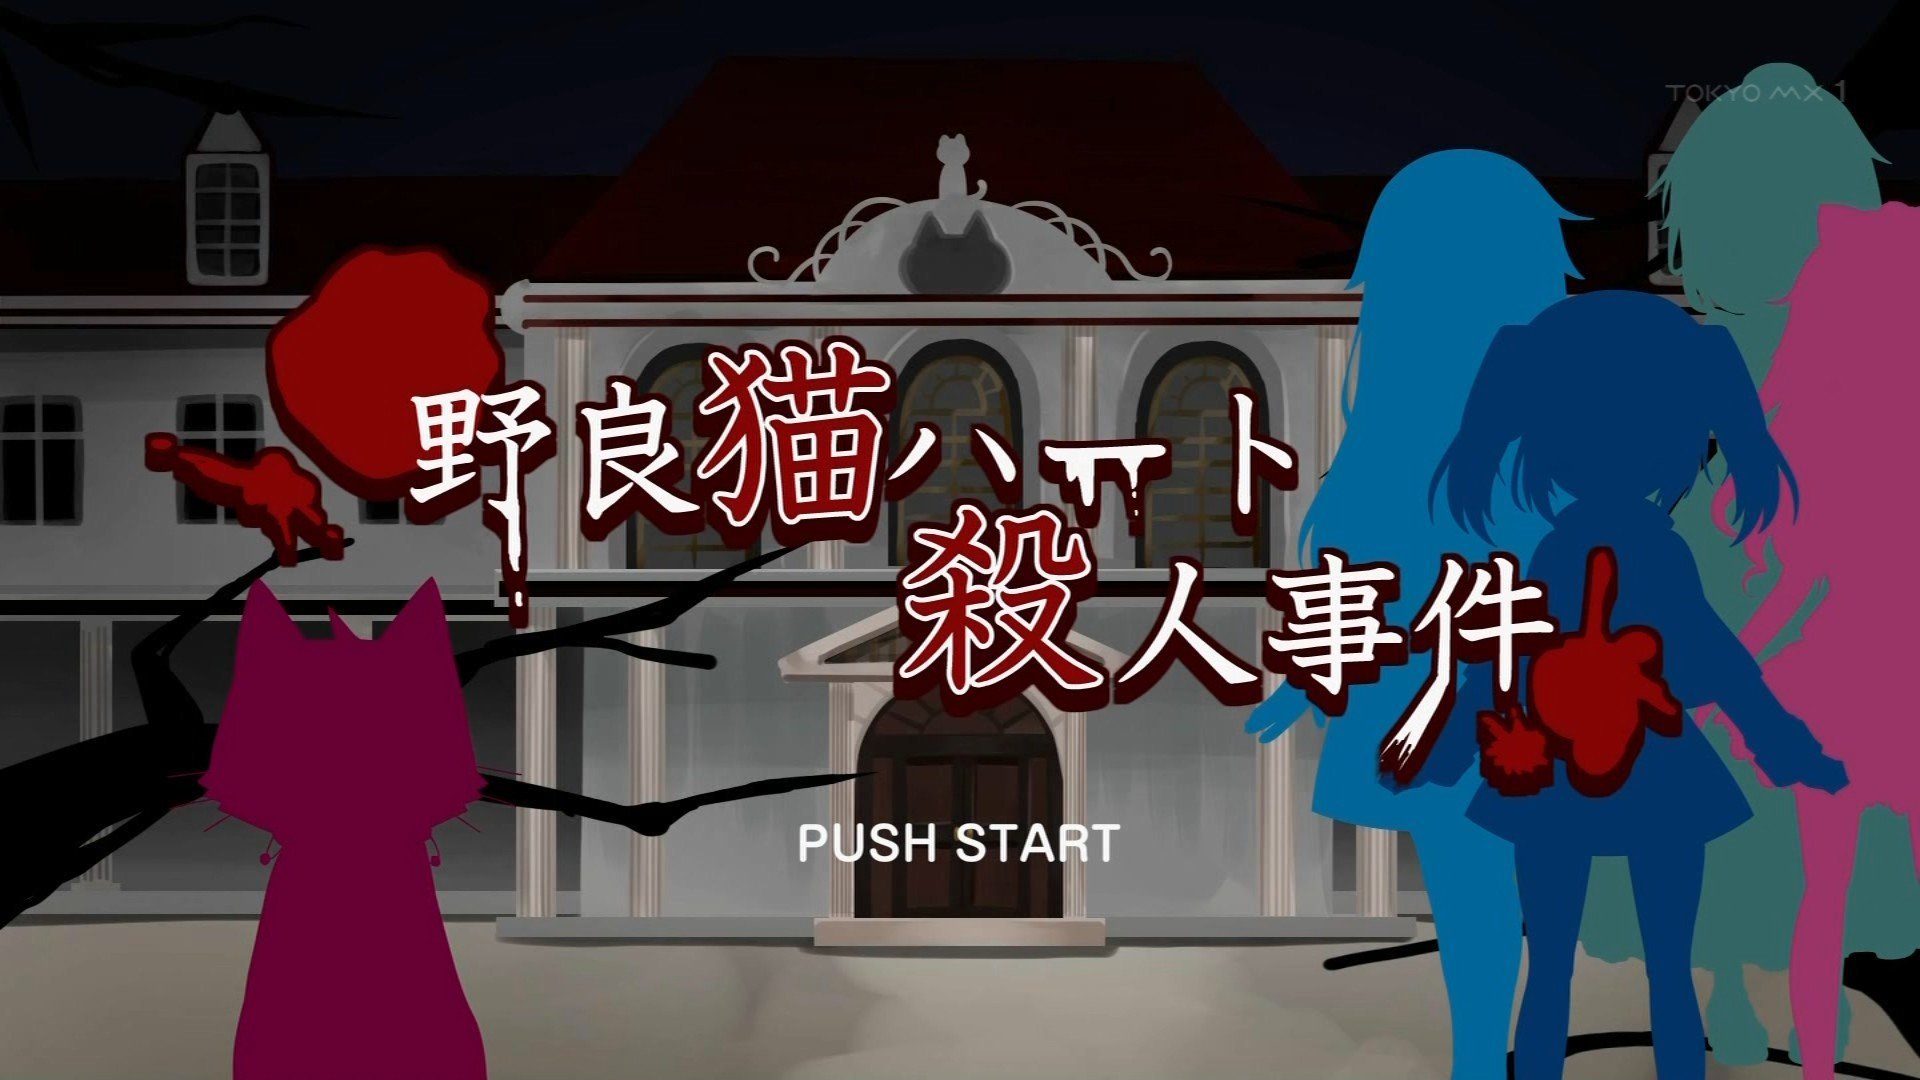 !? #noratoto #ノラとと #tokyomx https://t.co/4Eh18yT5d8